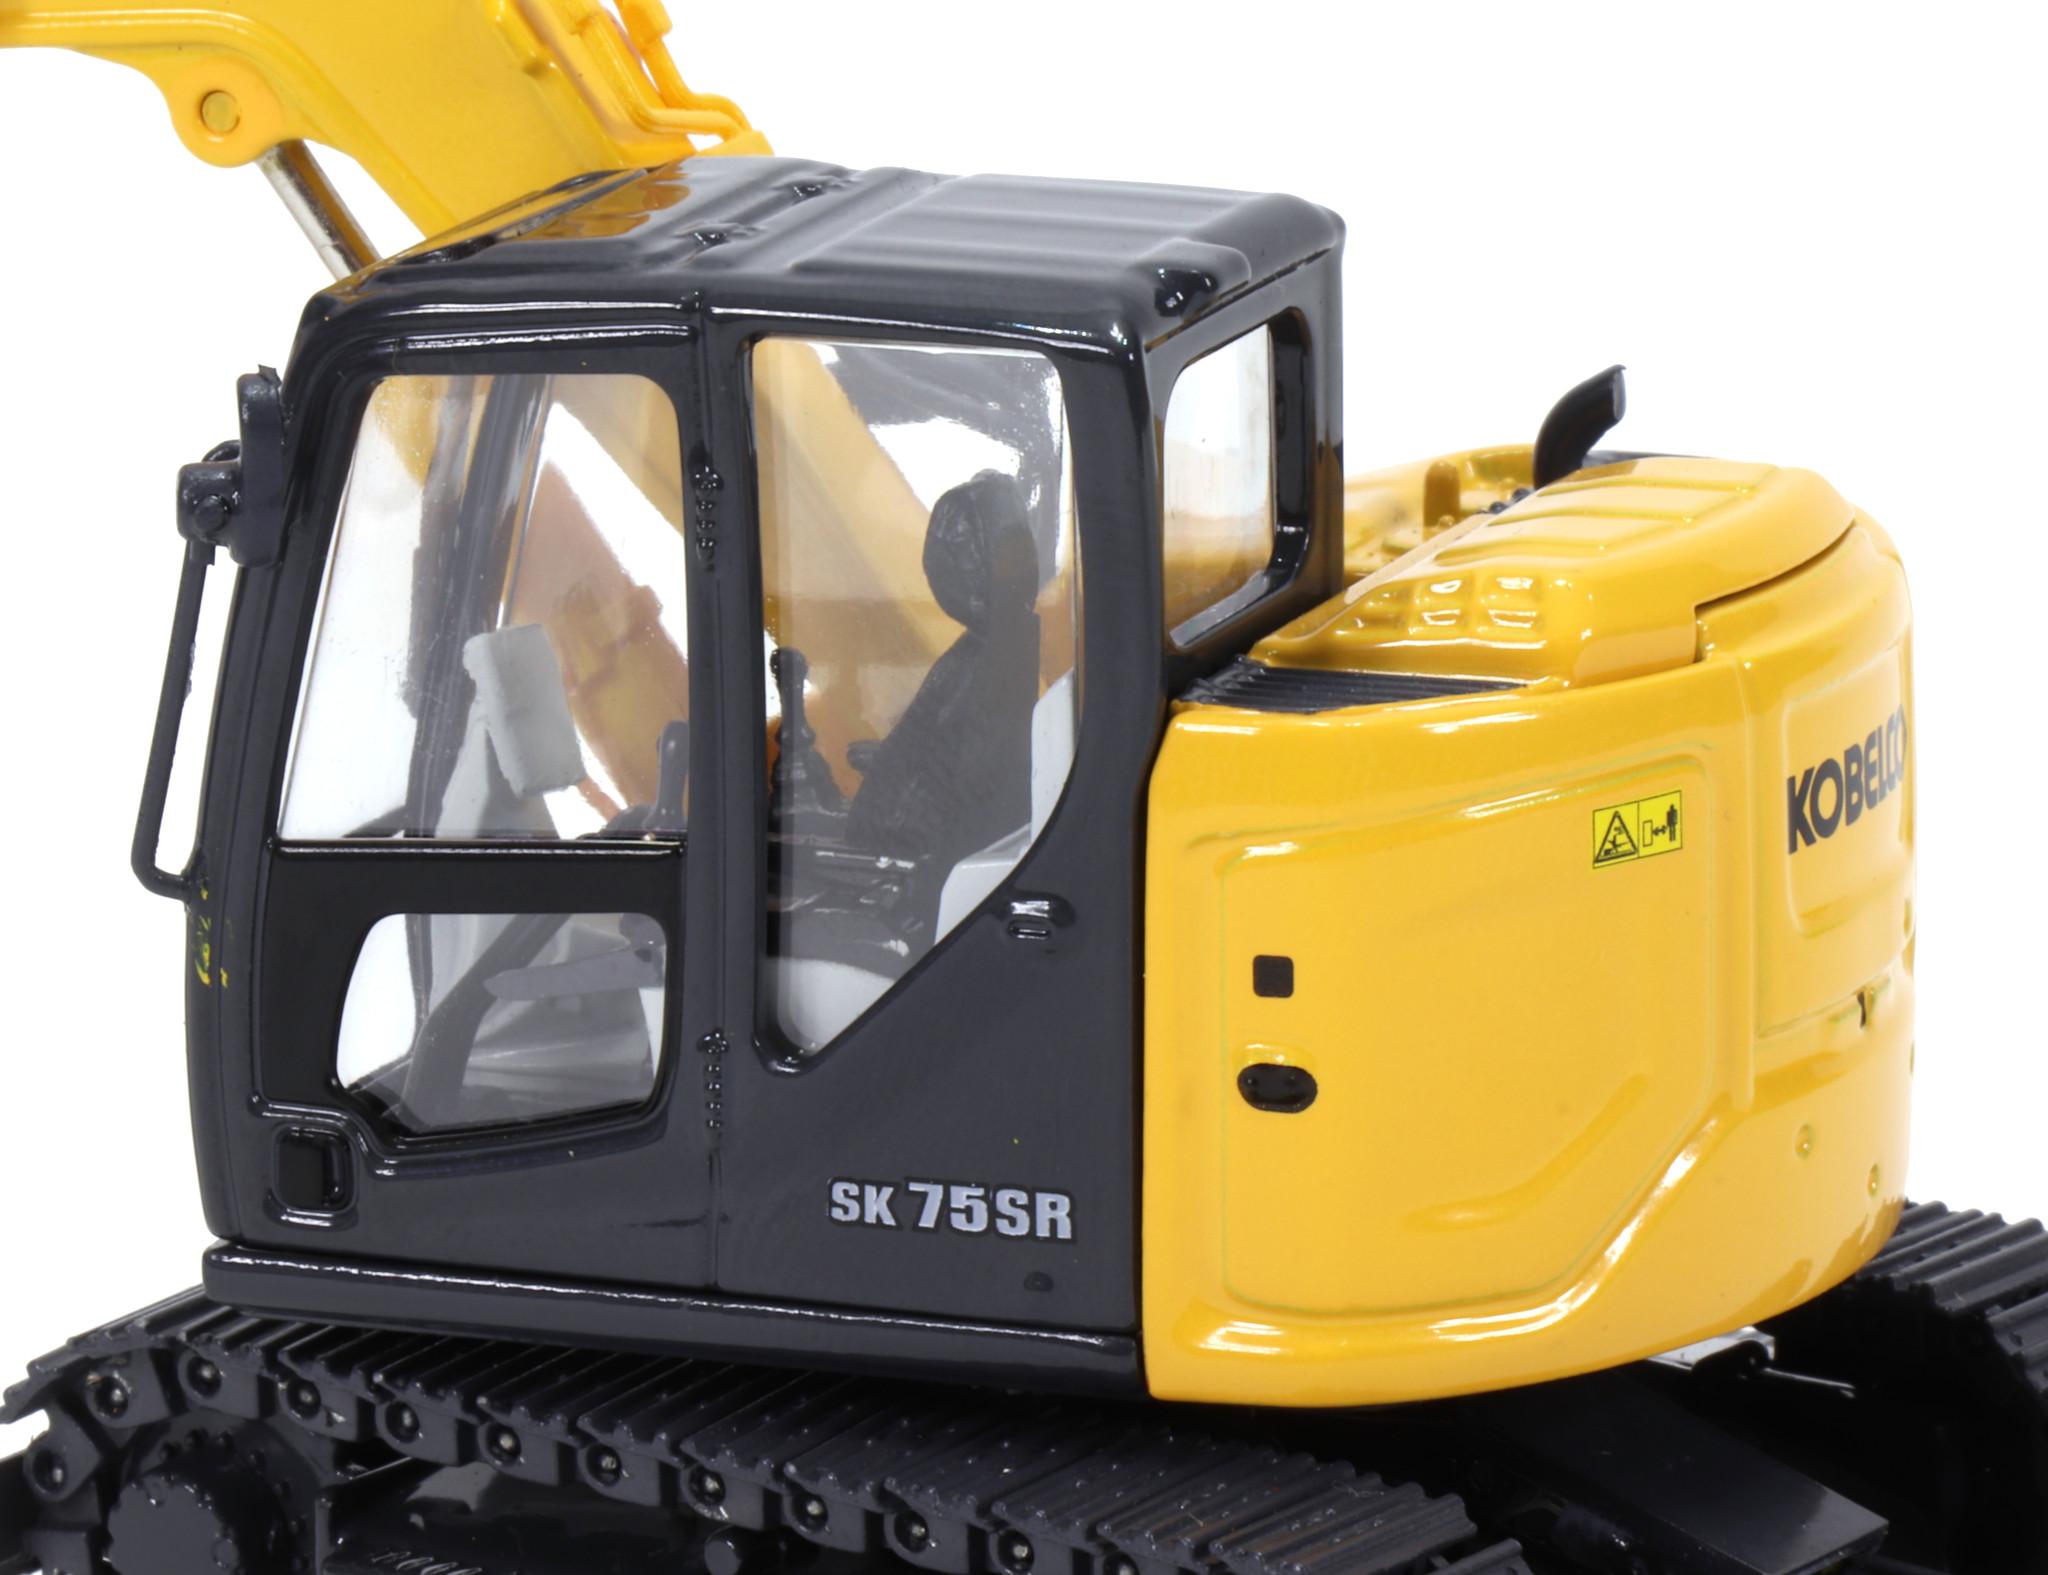 Motorart Modell SK75SR-7 USA Yellow Scale